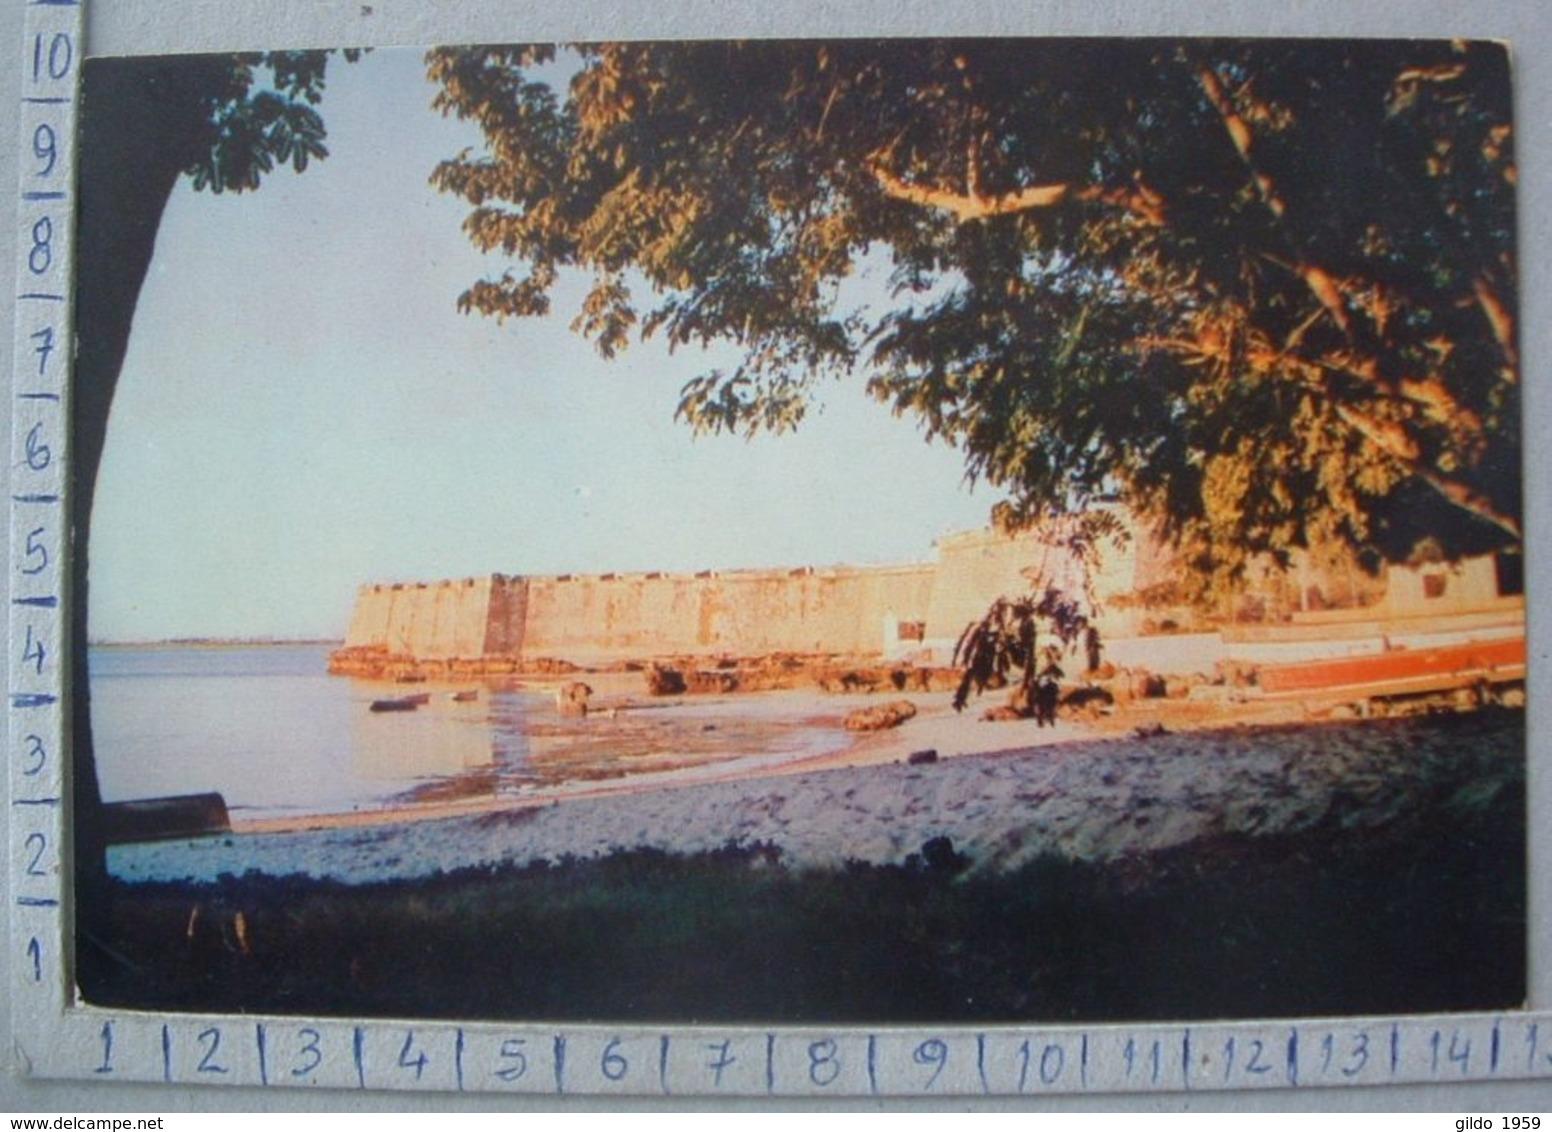 Moçambique - Ilha De Moçambique - Fortaleza De S.Sebastião - SP1983 - Mozambique